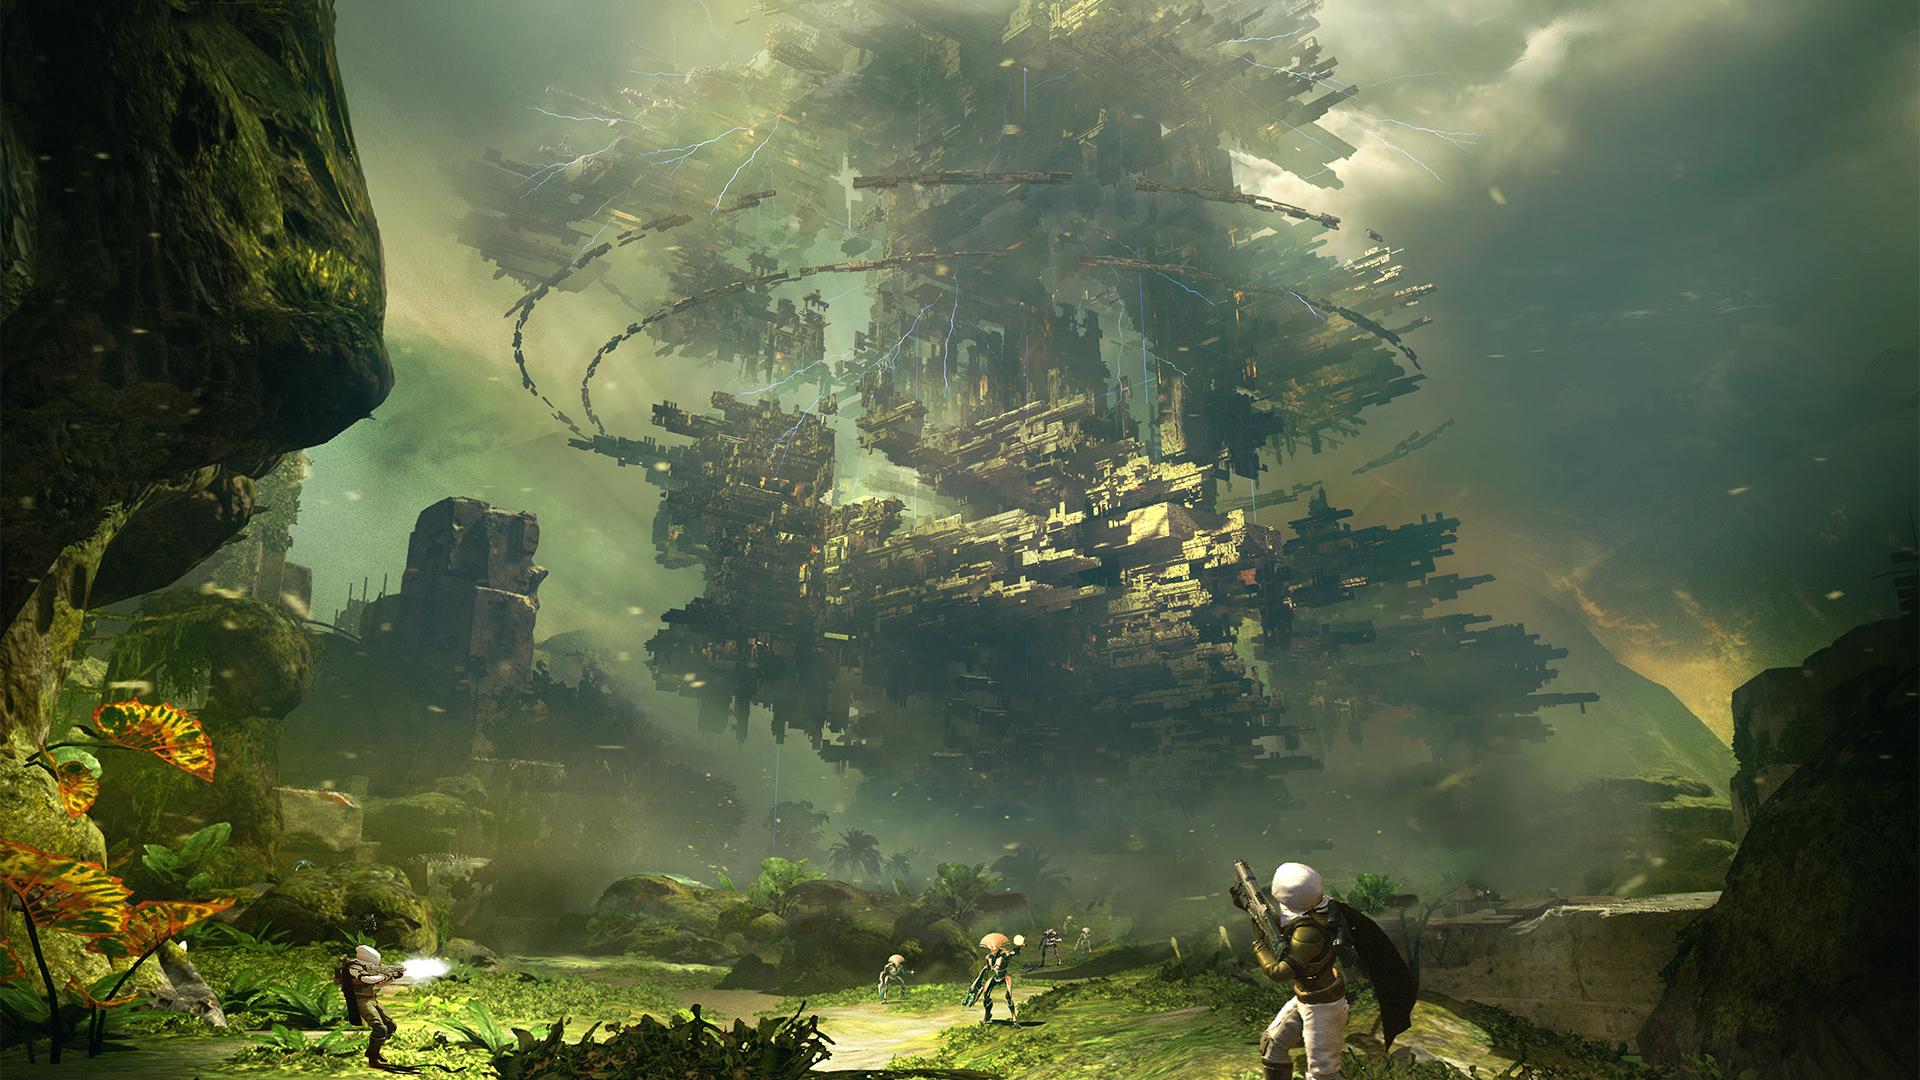 game-destiny-landscape-citadel-1920x1080